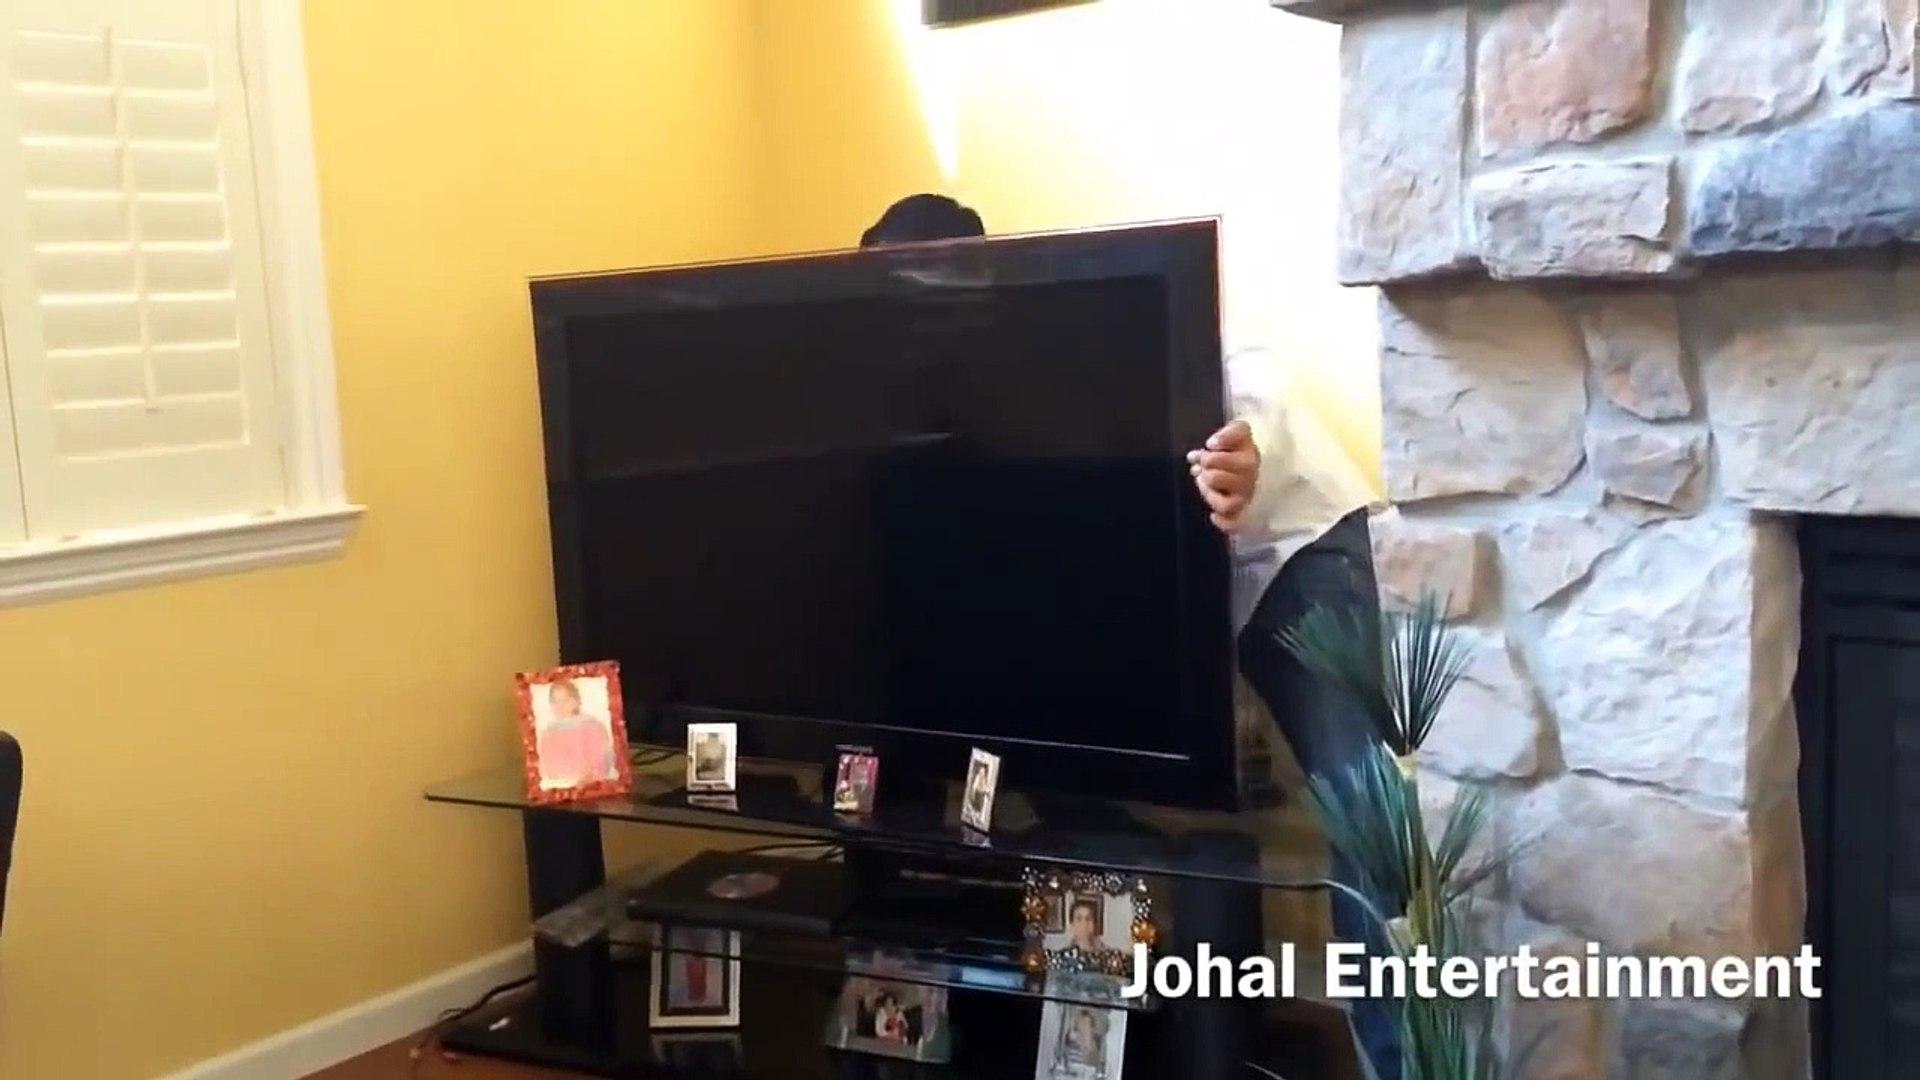 Home Robbery Prank Pranks on People Best Pranks Funny Pranks Best Pranks 2014